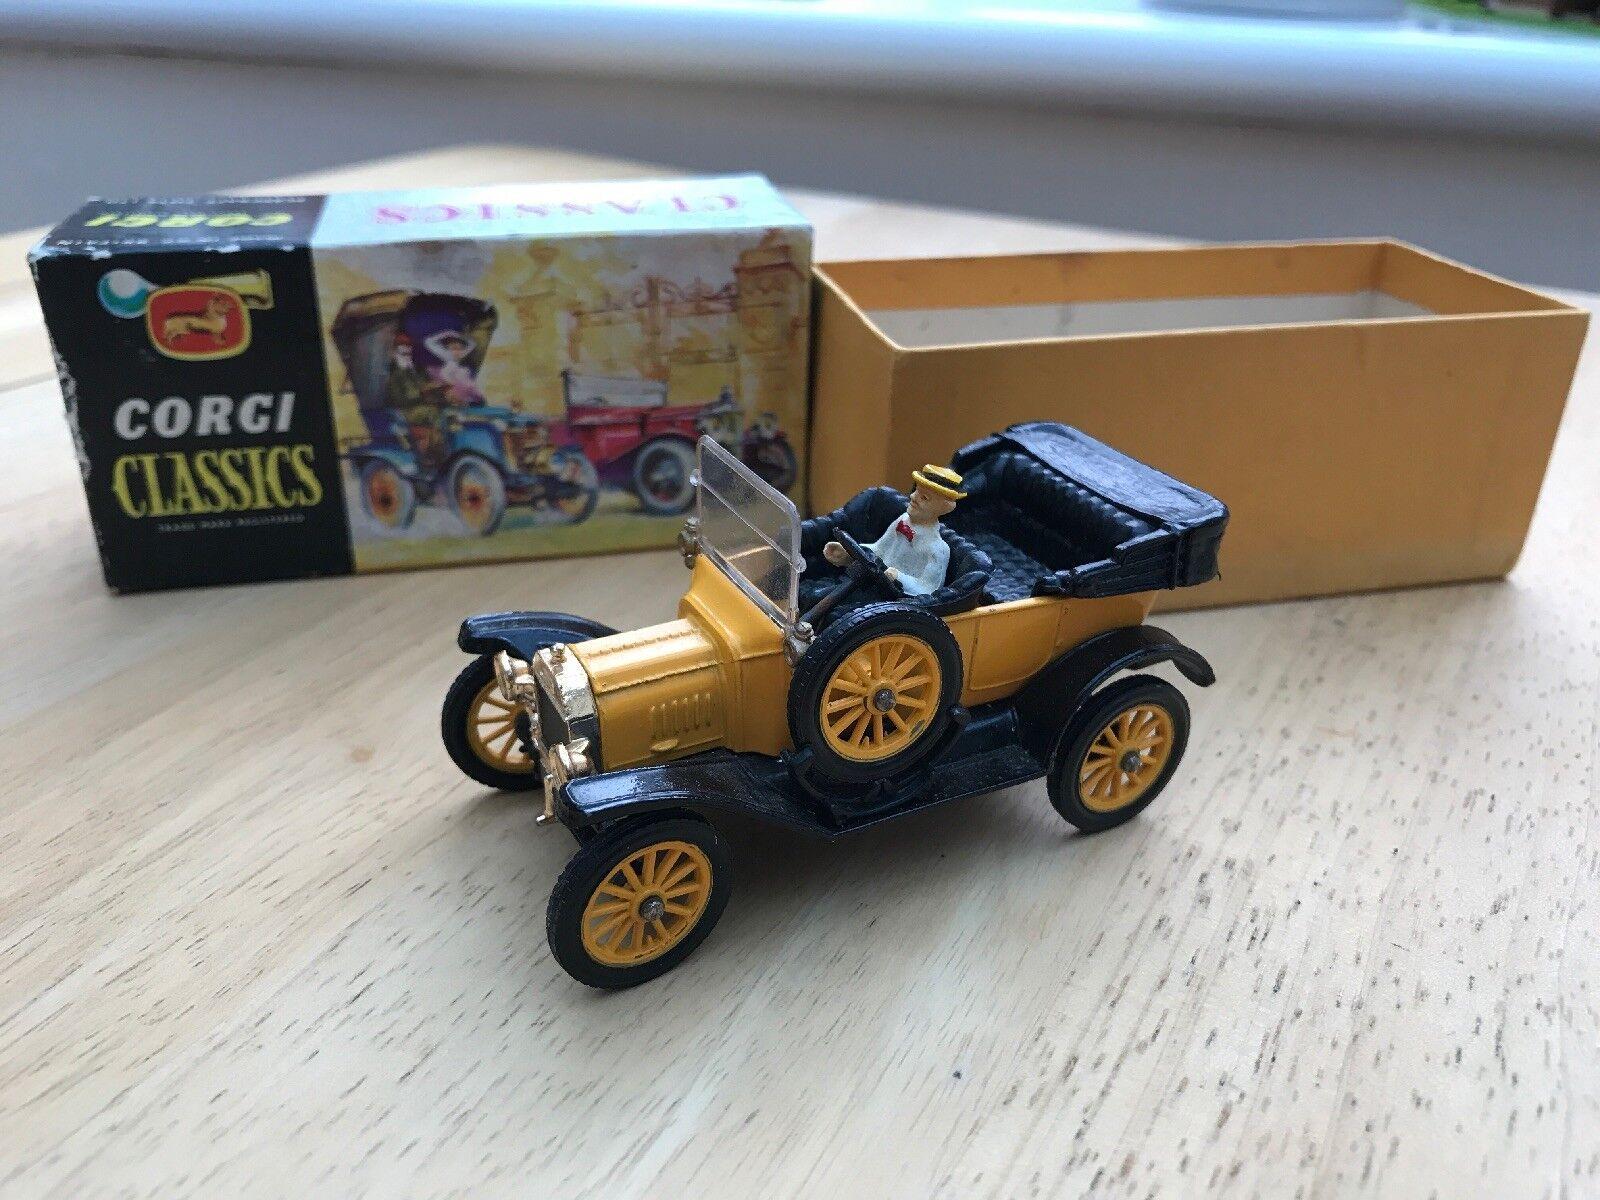 Classic Corgi Model T Ford 1915 Vintage Car Toy